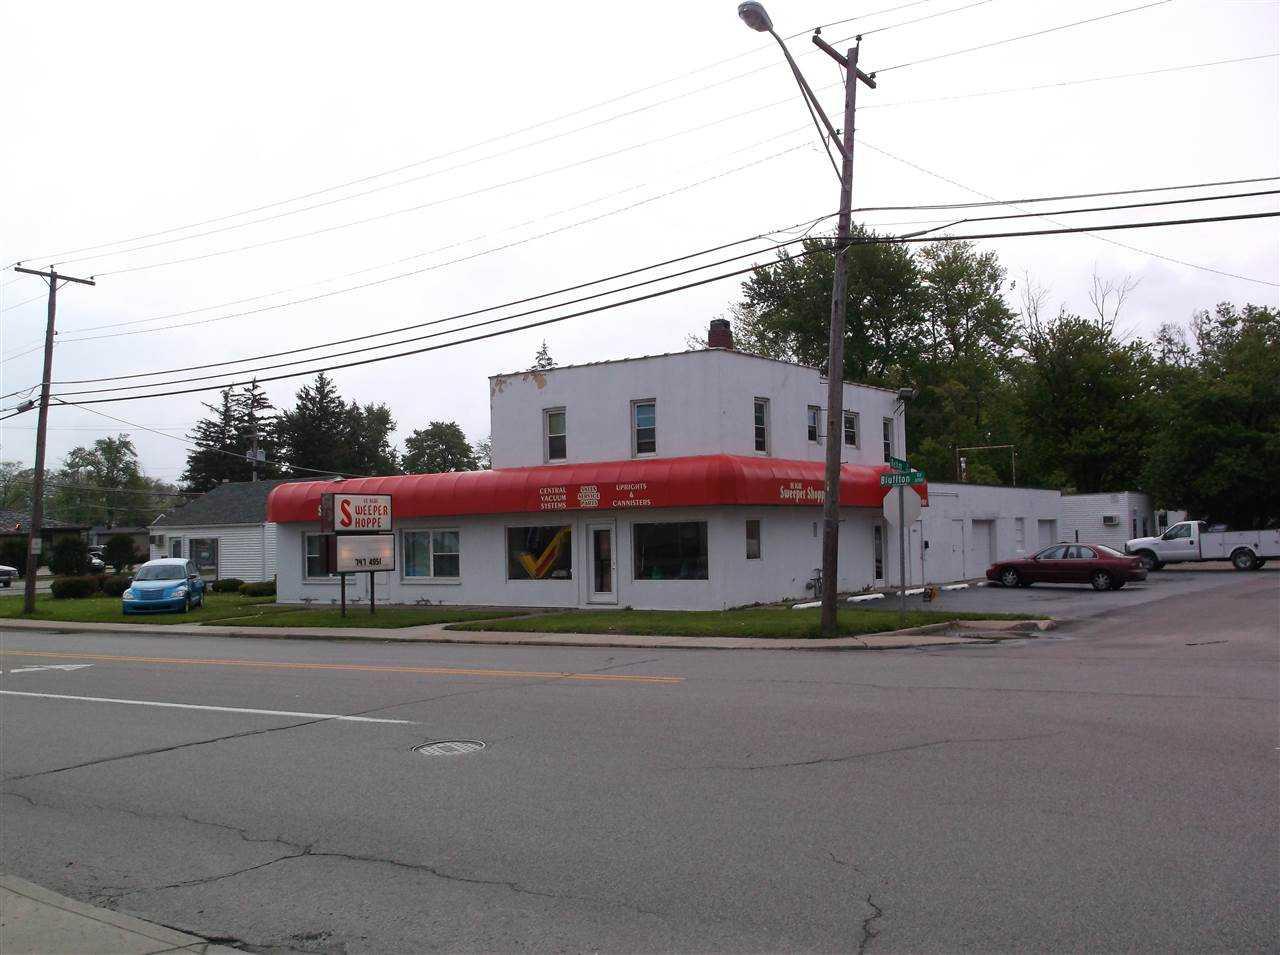 6915 Bluffton Road Fort Wayne,IN 46809 201308984